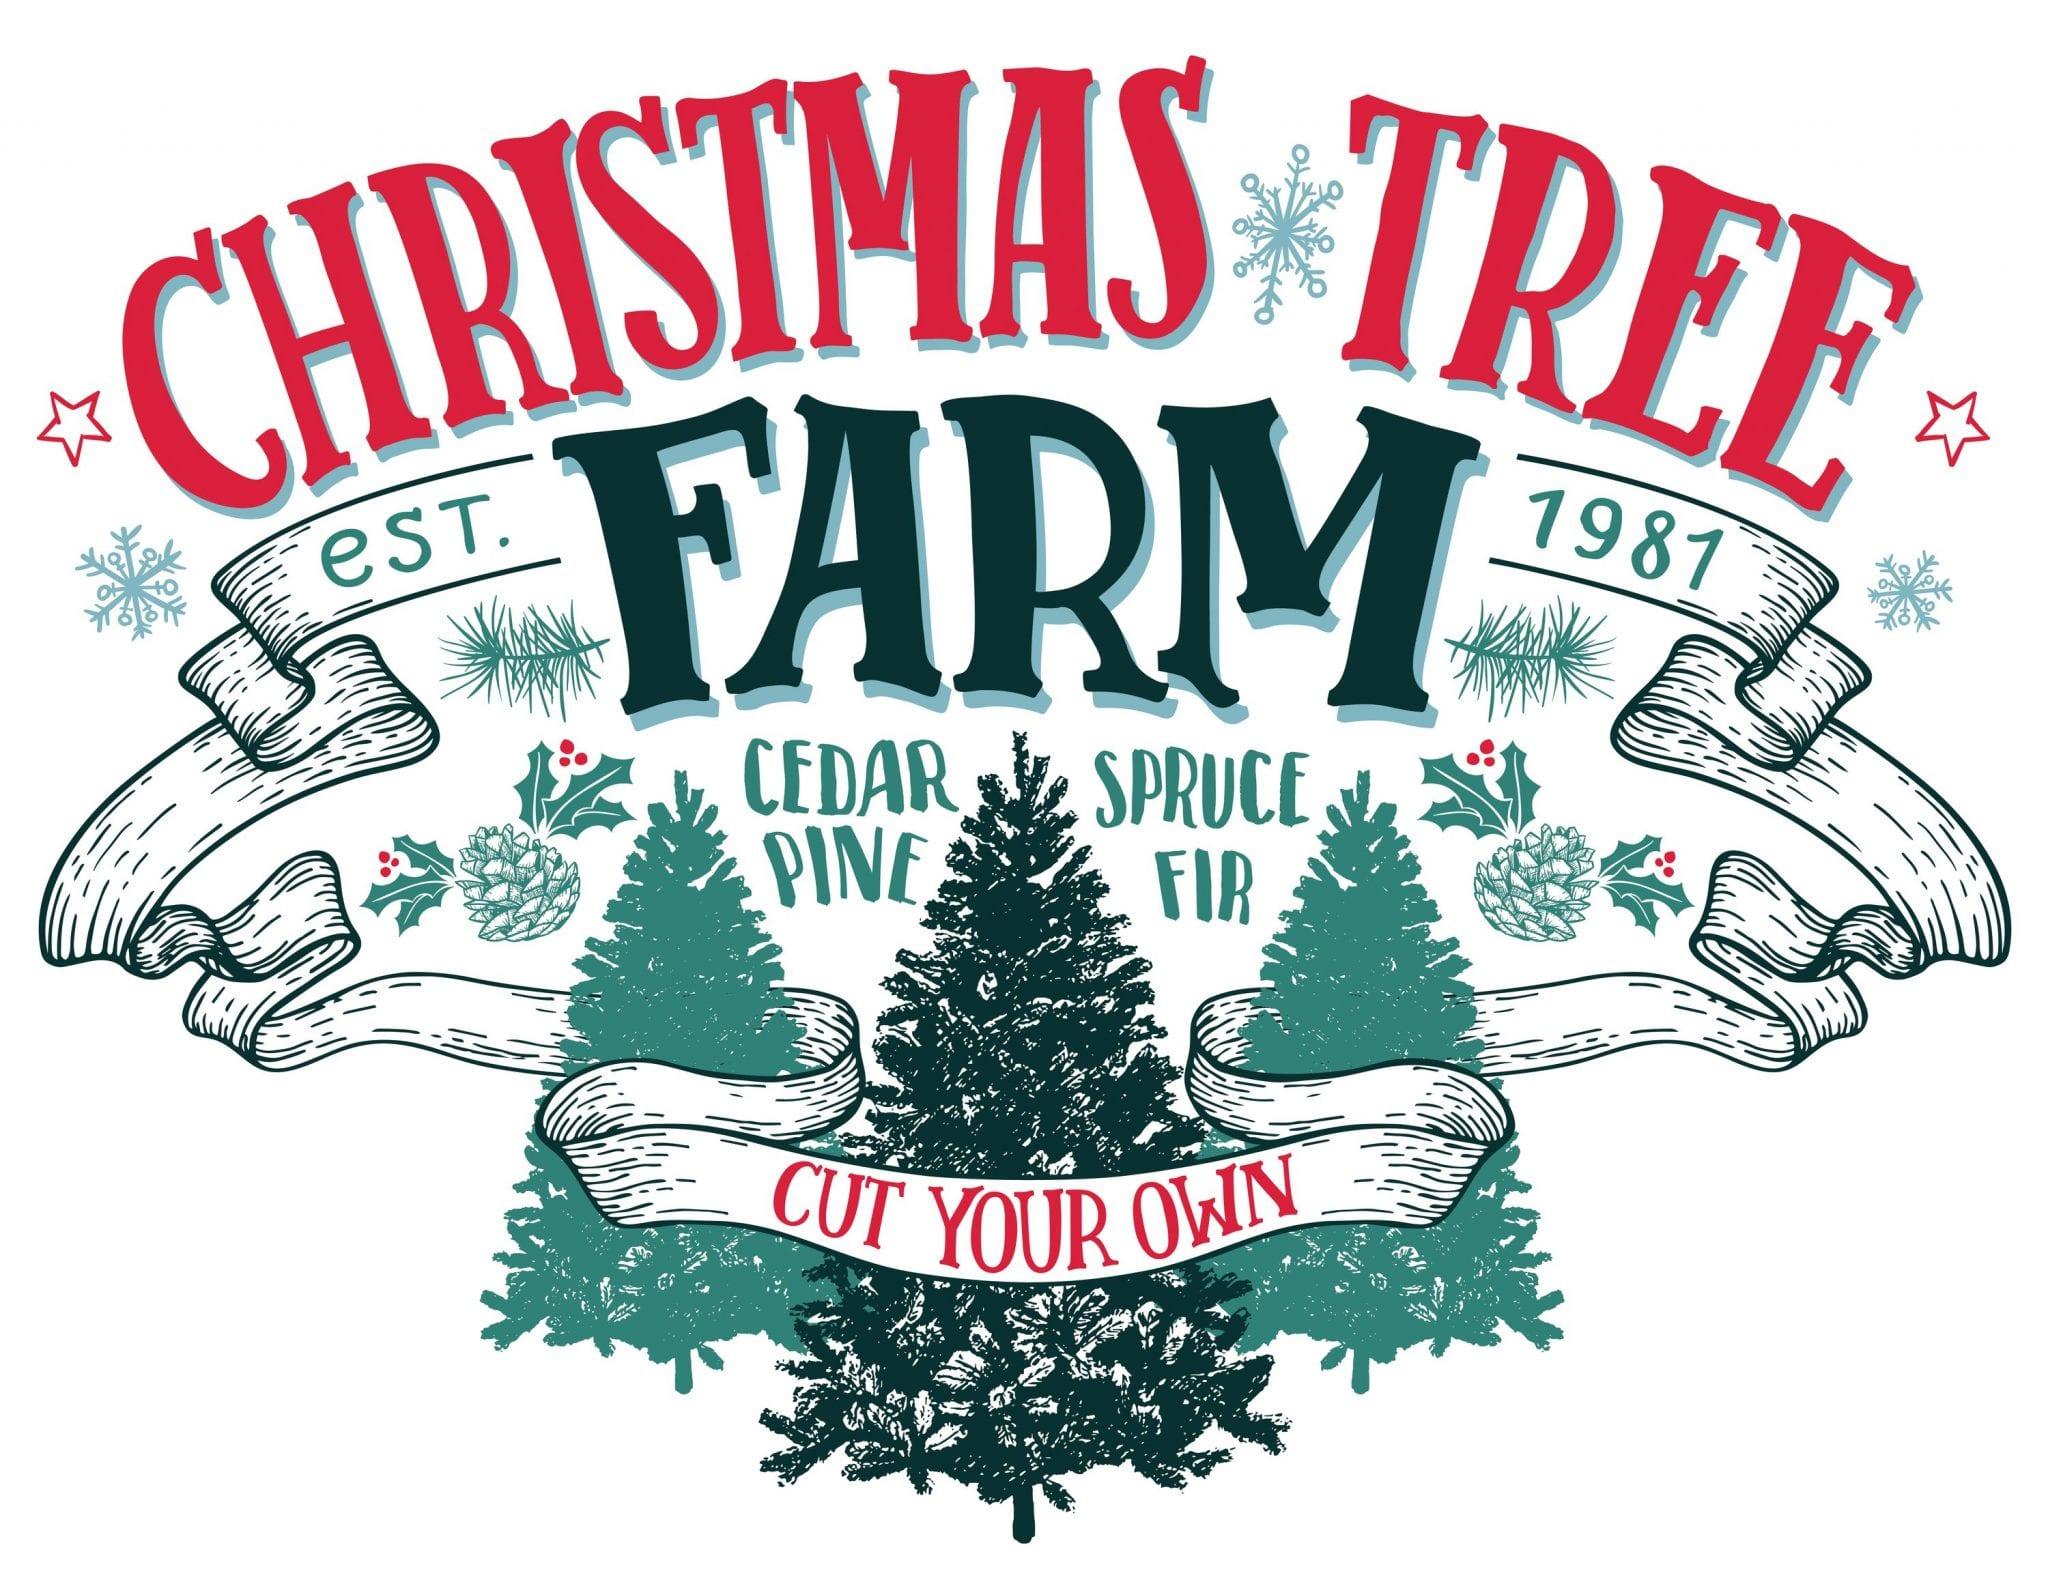 A Christmas Tradition